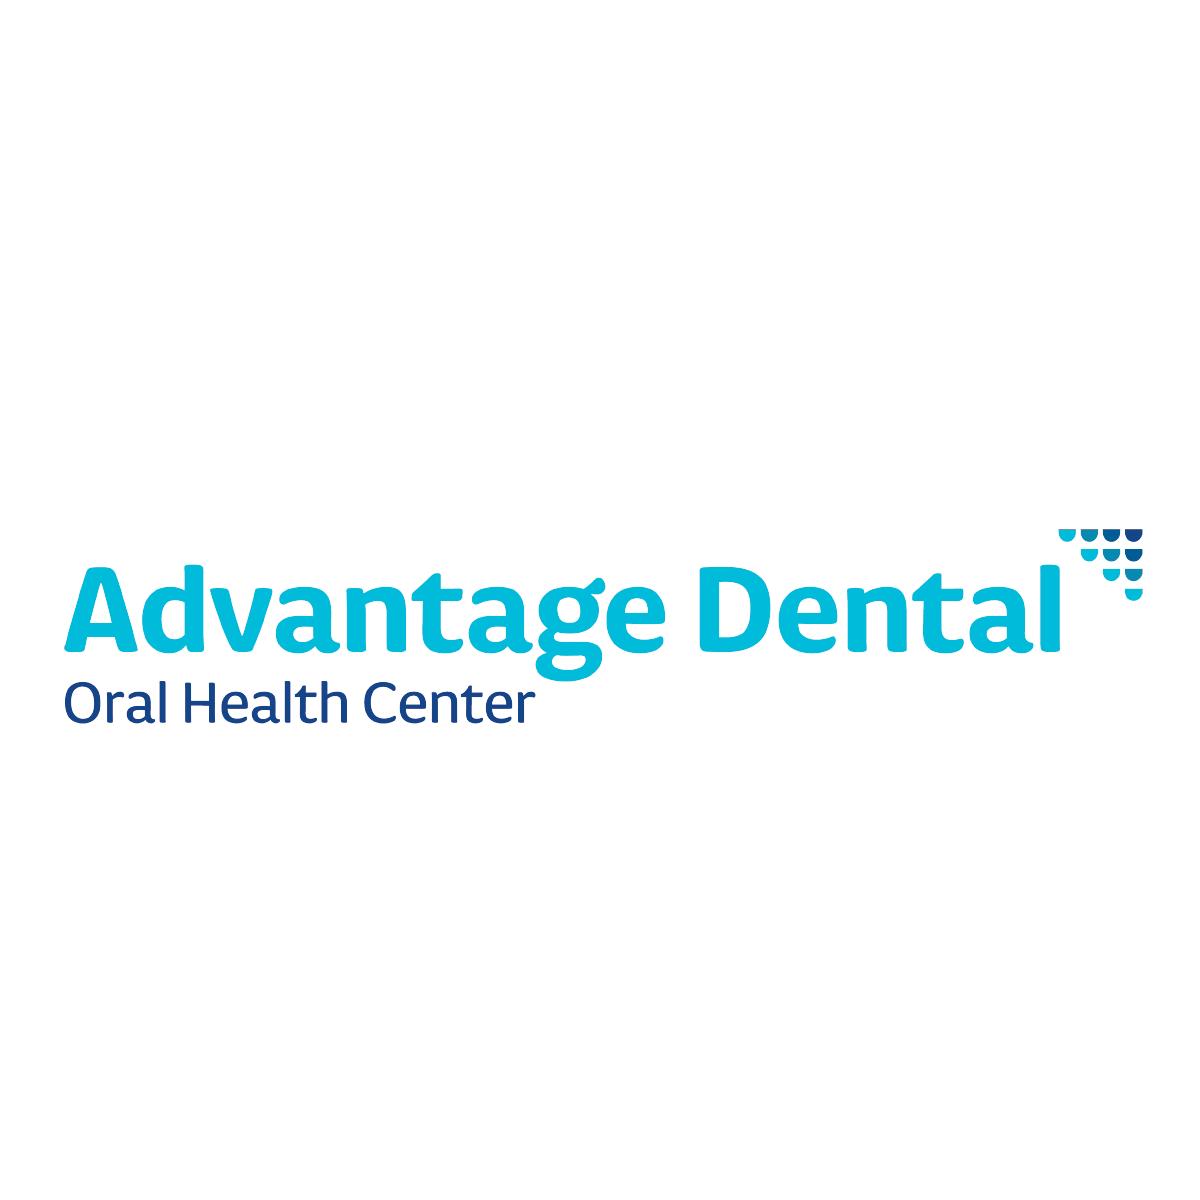 Advantage Dental Oral Health Center (formerly Gentech Dentist)